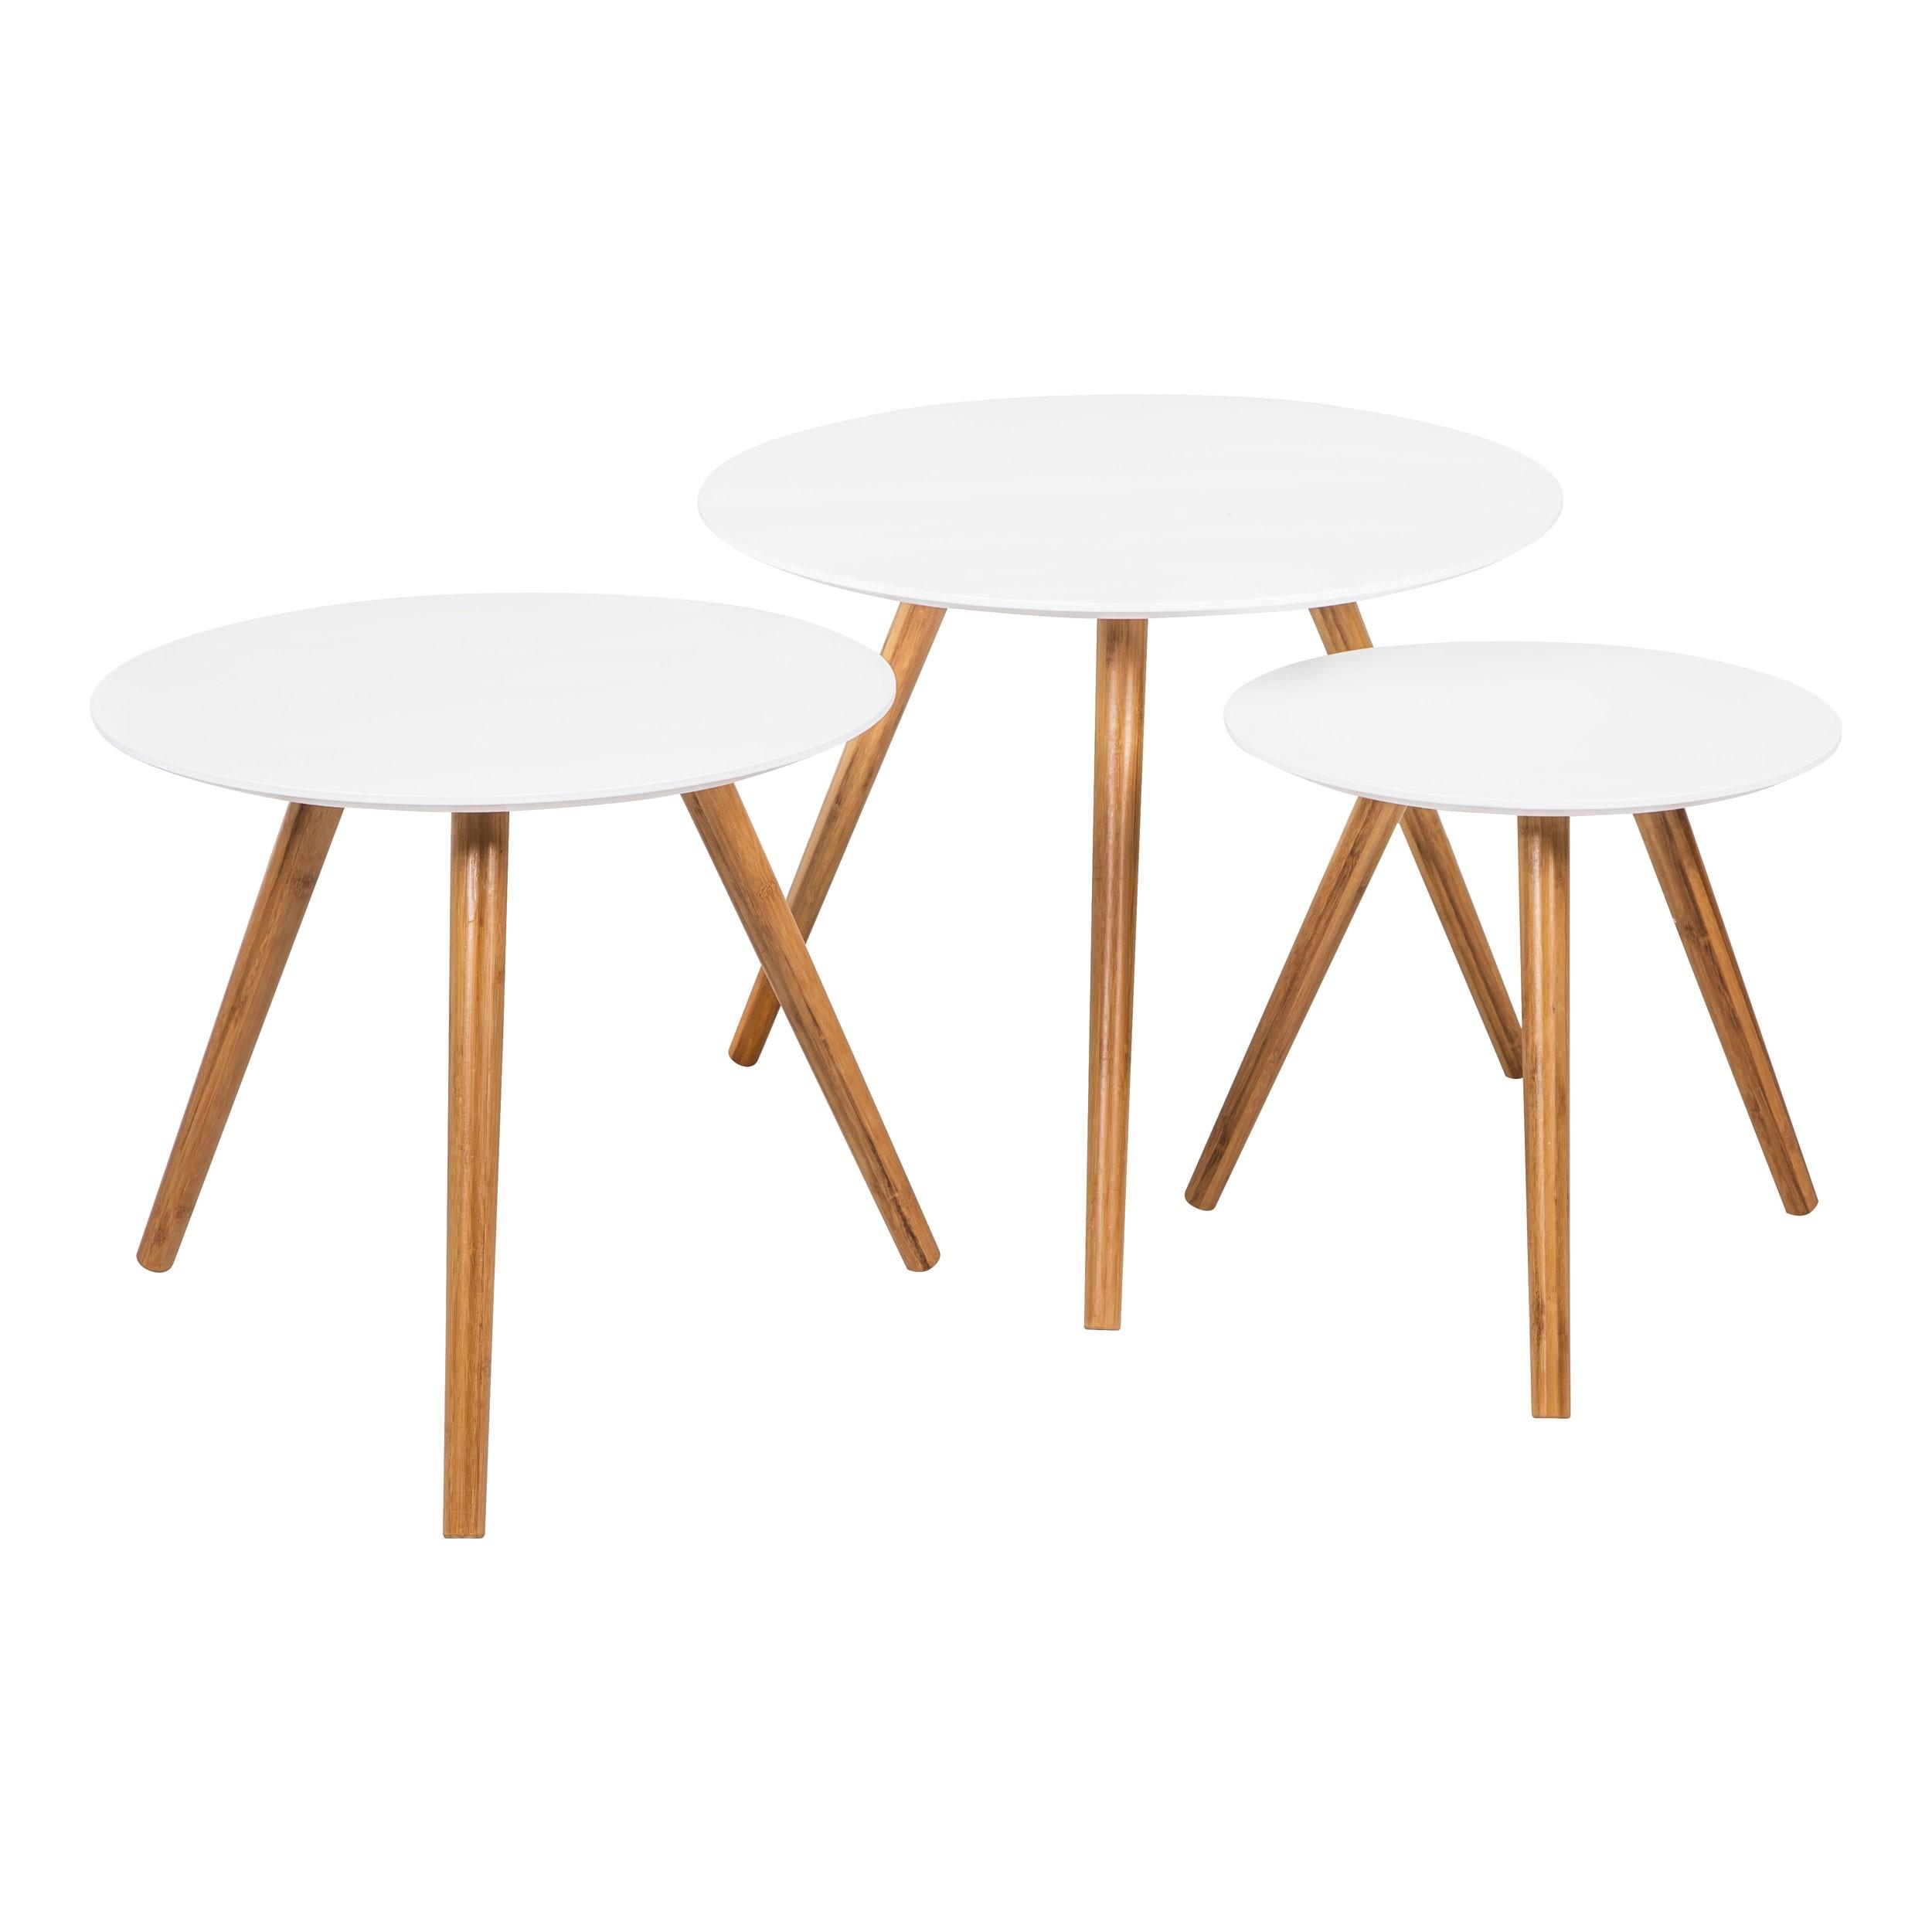 3 table basse bois